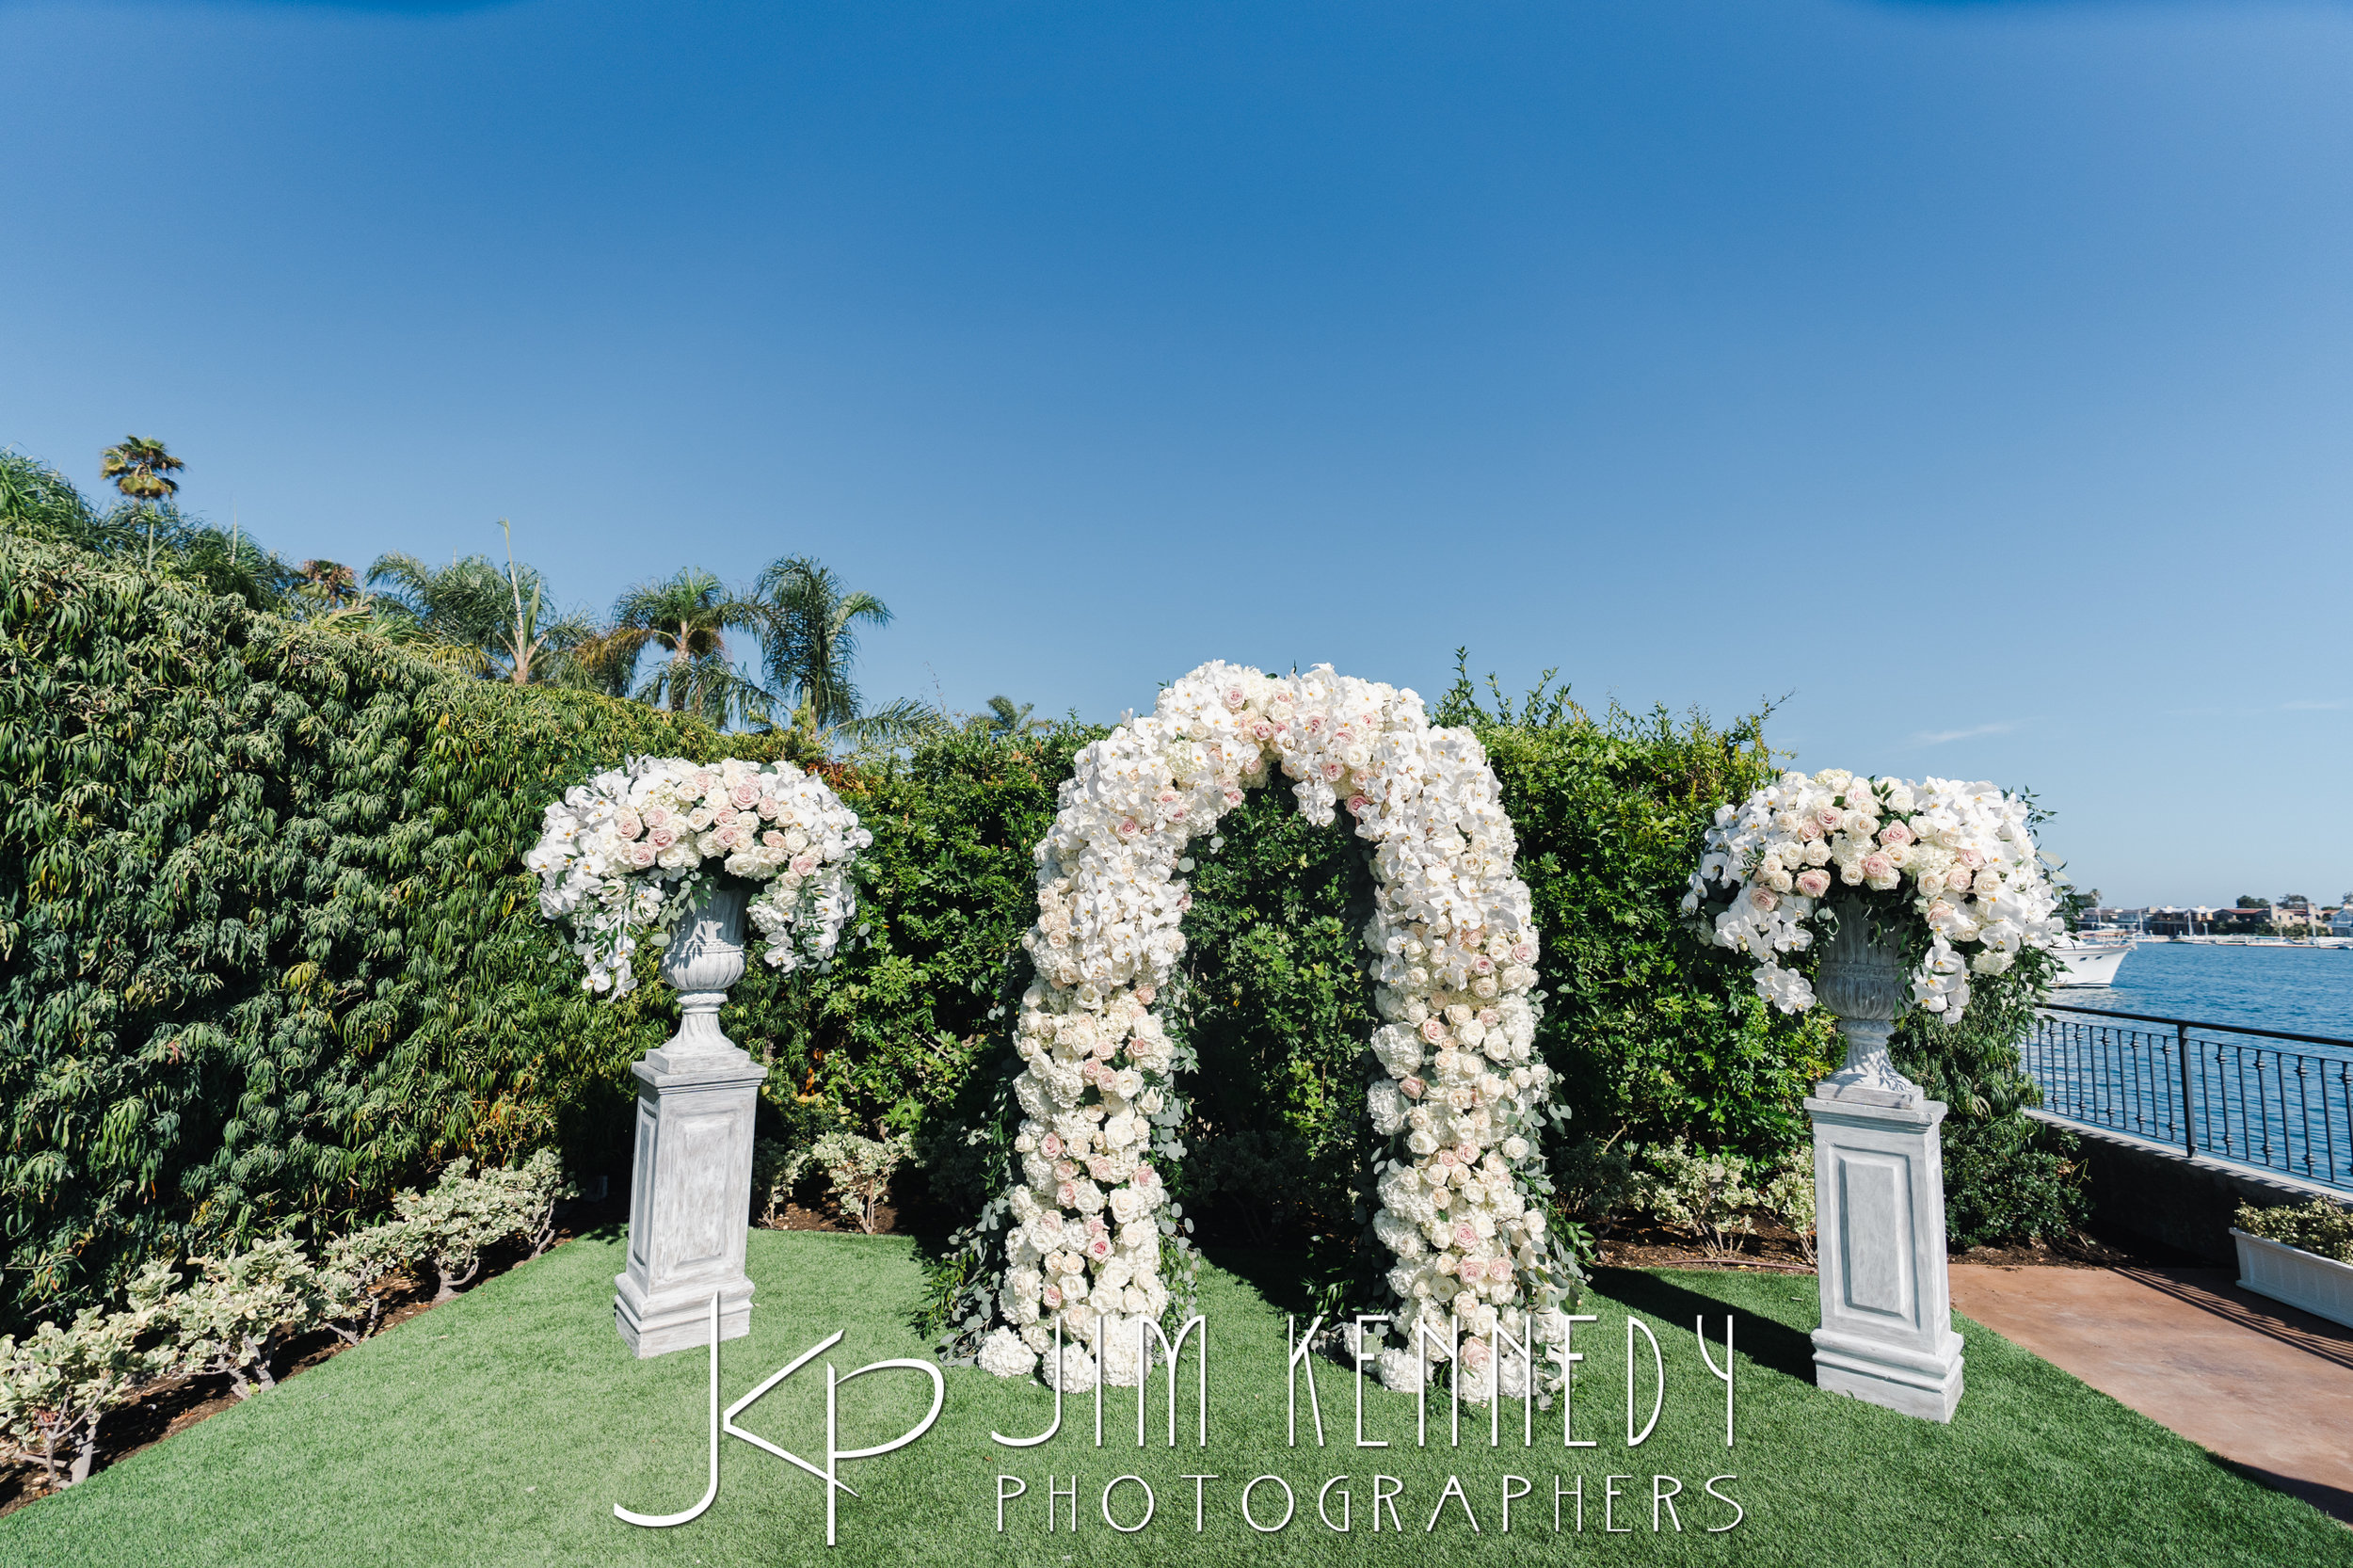 balboa-bay-resort-wedding-brooke-kevin_0079.JPG